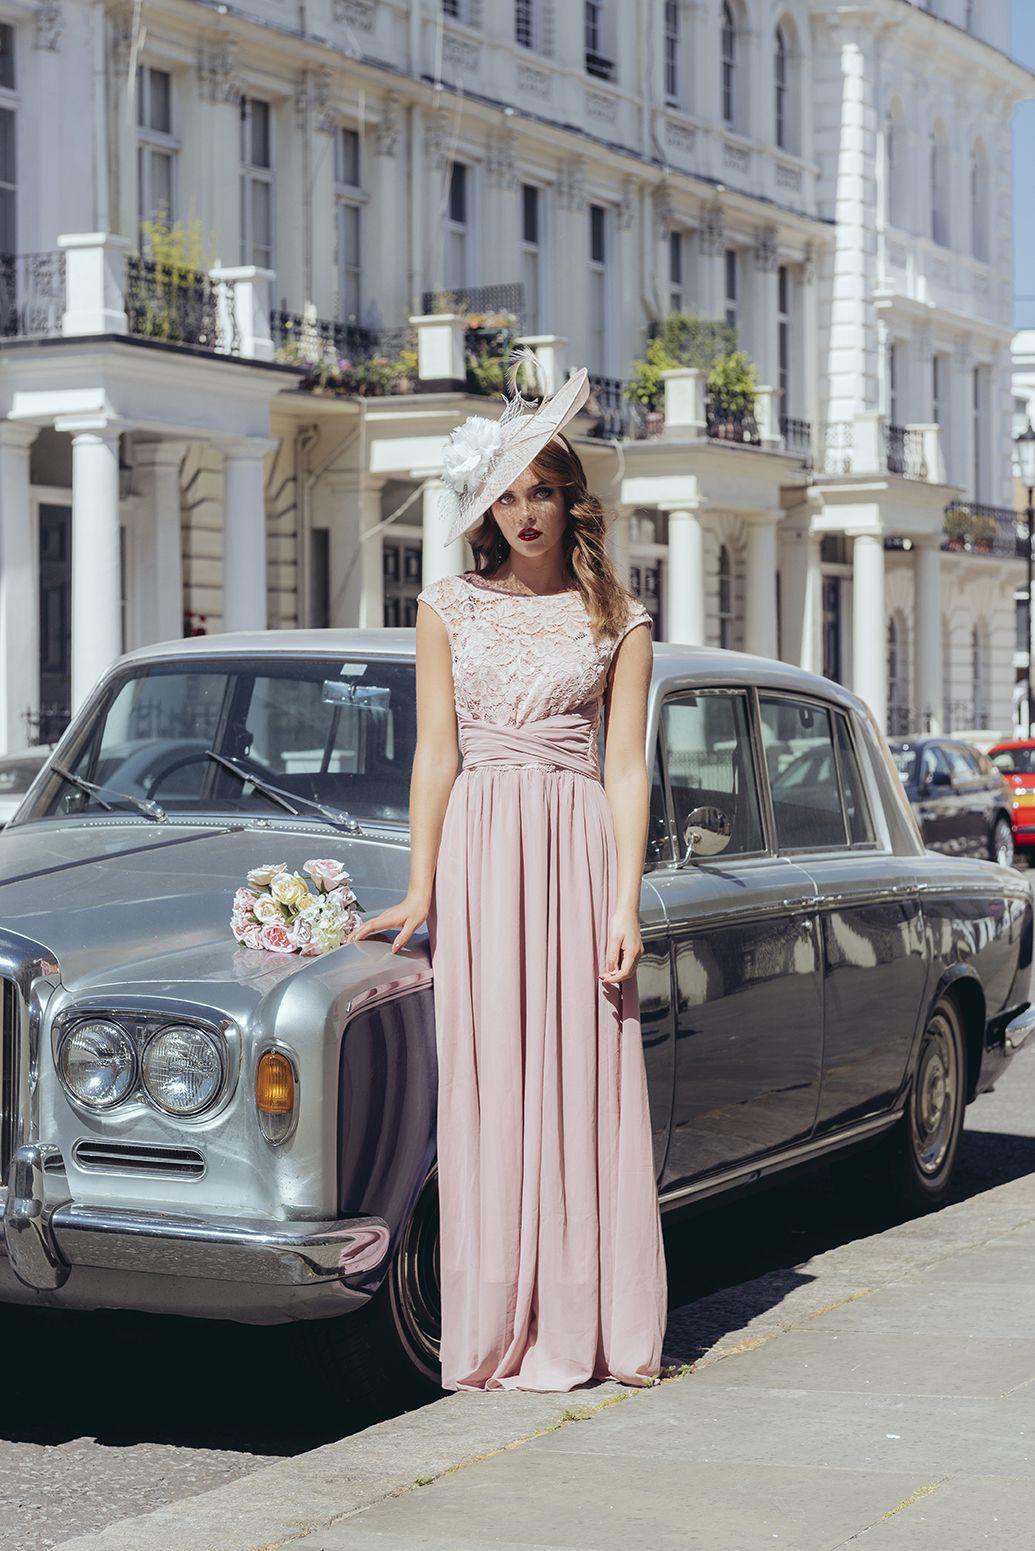 Jolie Moi Sofia Lace Bodice Maxi Dress Available In 7 Colours Lace Bodice Maxi Dress Maxi Dress Dresses [ 1551 x 1035 Pixel ]